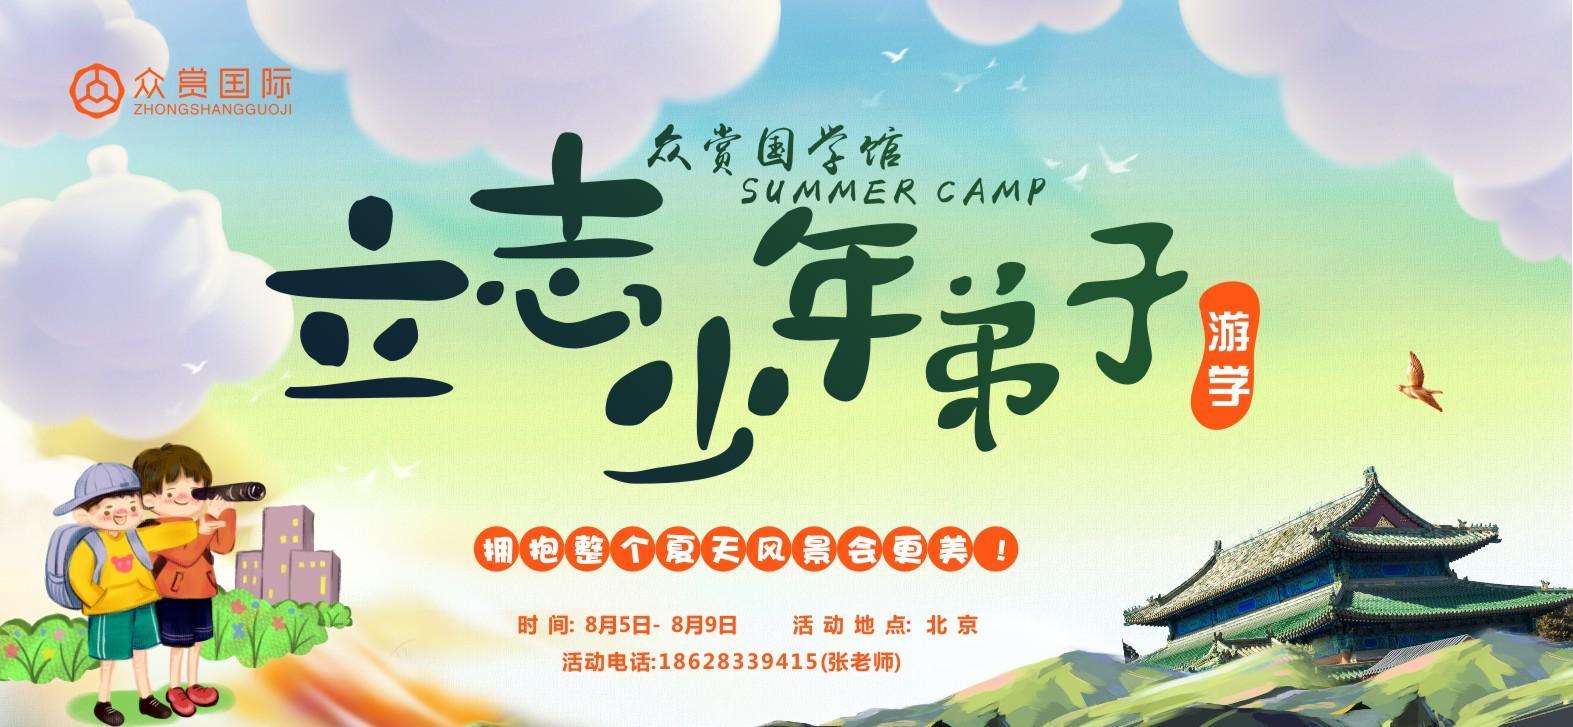 <b><font color='#4ae6cf'>立志少年弟子首都游学丨这个夏天,让我们的梦想更加炽热!</font></b>